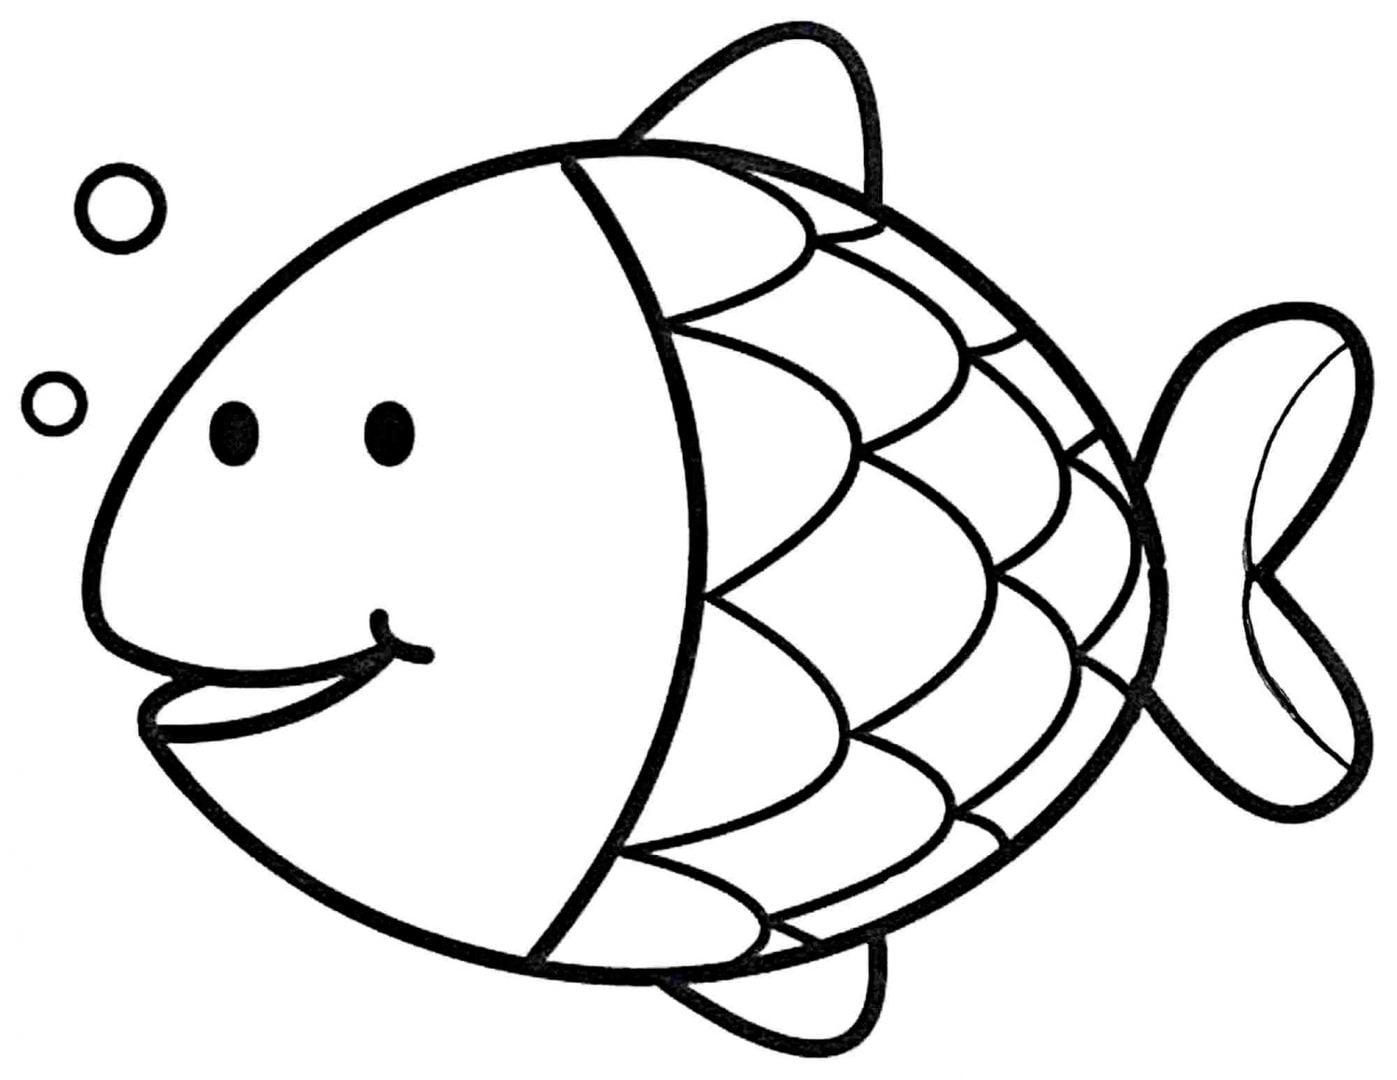 pez www.dibujosfaciles.es